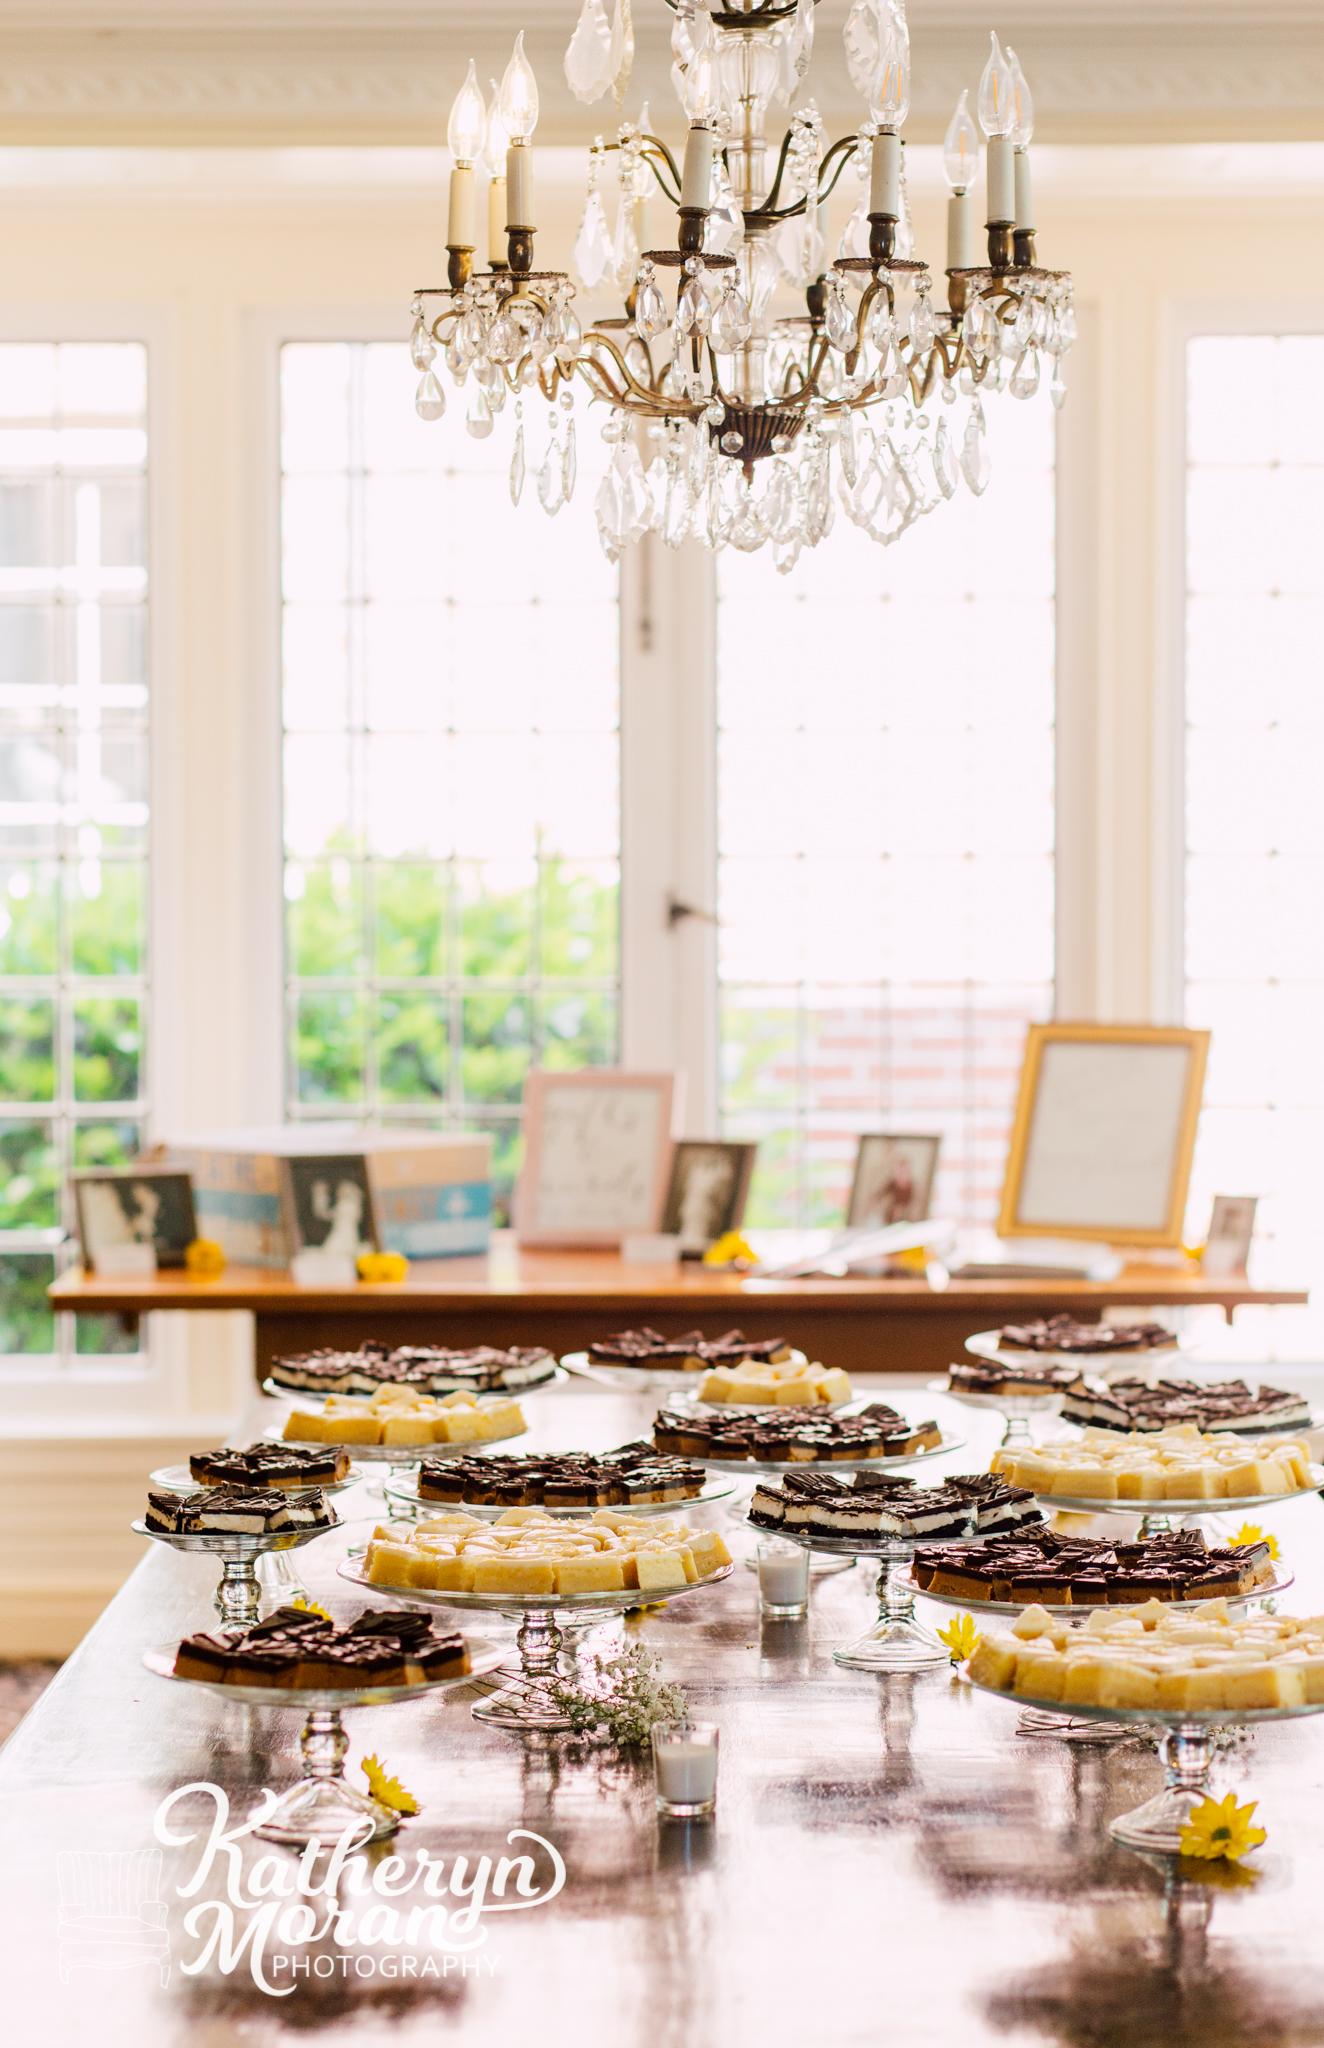 bellingham-wedding-photographer-lairmont-manor-katheryn-moran-15.jpg